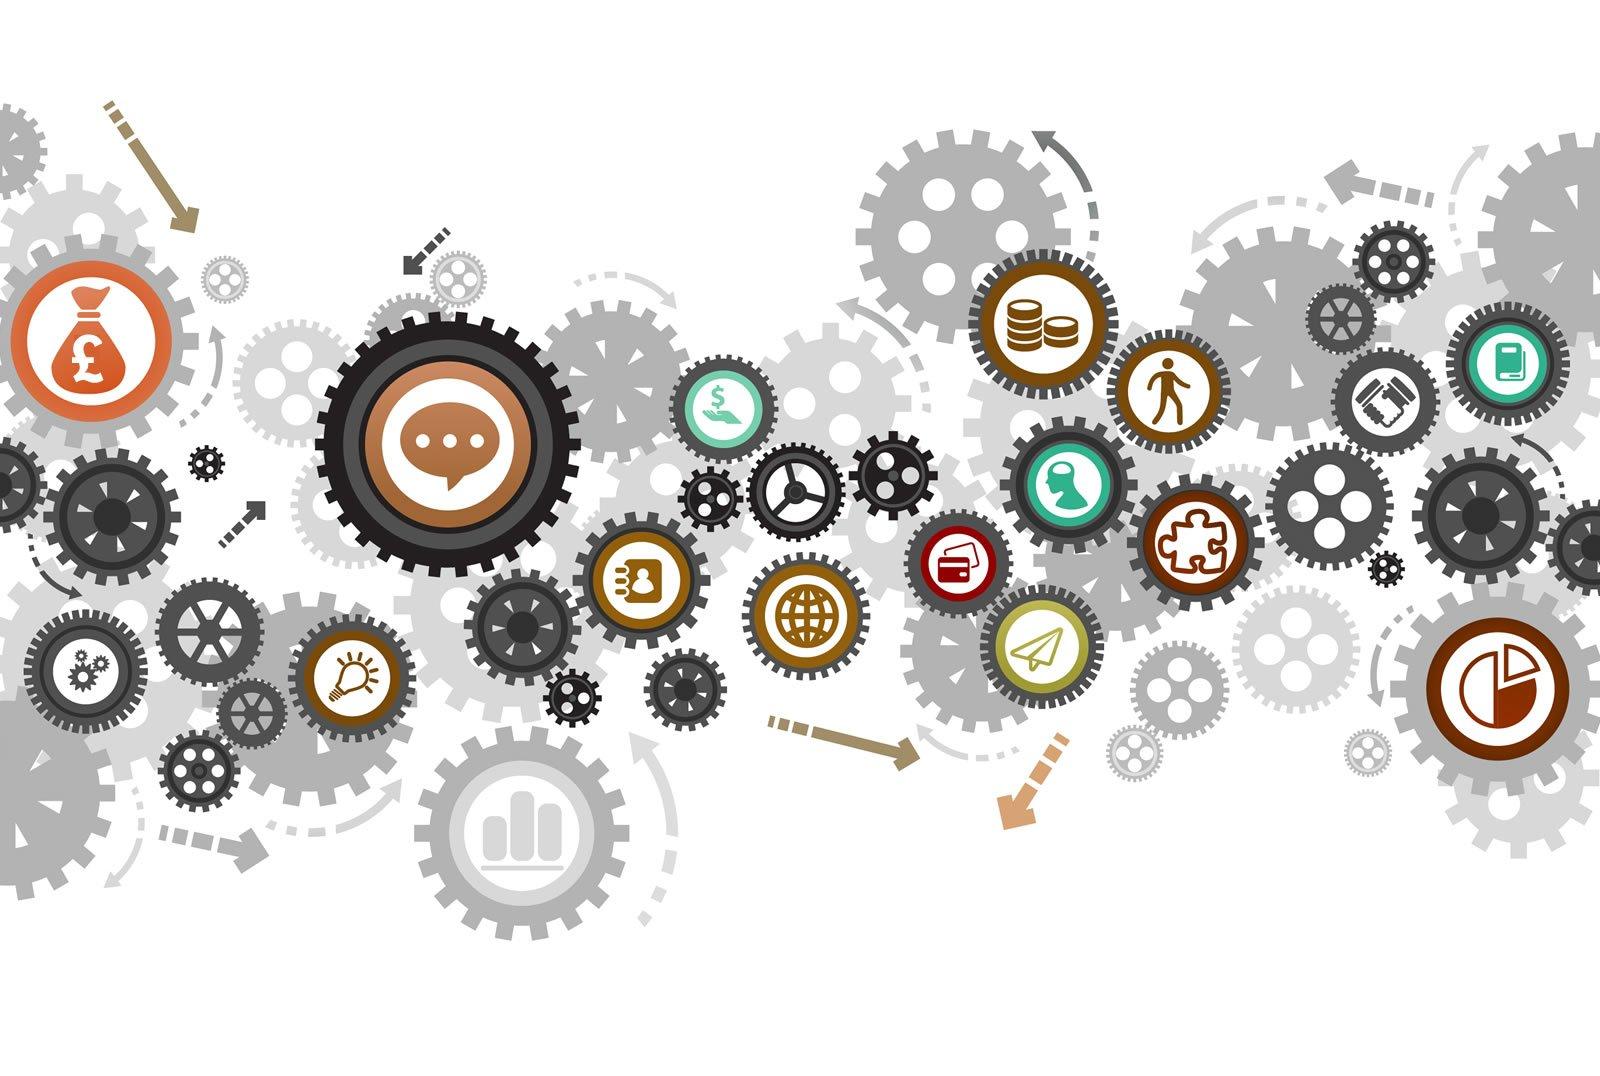 development - Mathesis Προχωρημένα θέματα ανάπτυξης ιστοσελίδων